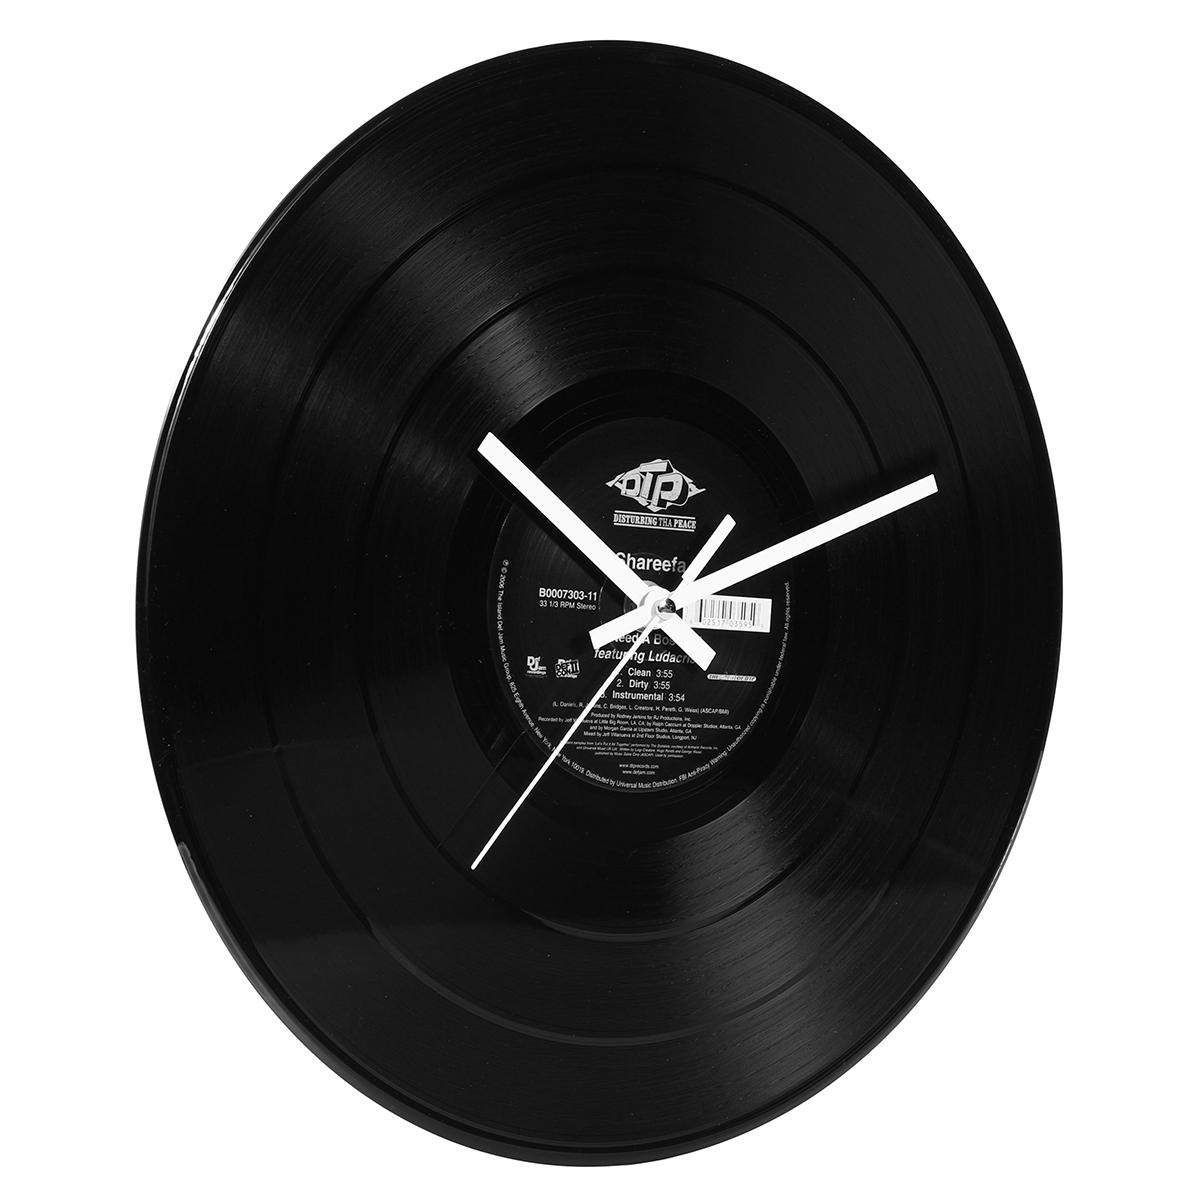 12 Inch Retro Classic Vinyl phonograph Record Album Wall Clock Home Decor Gift